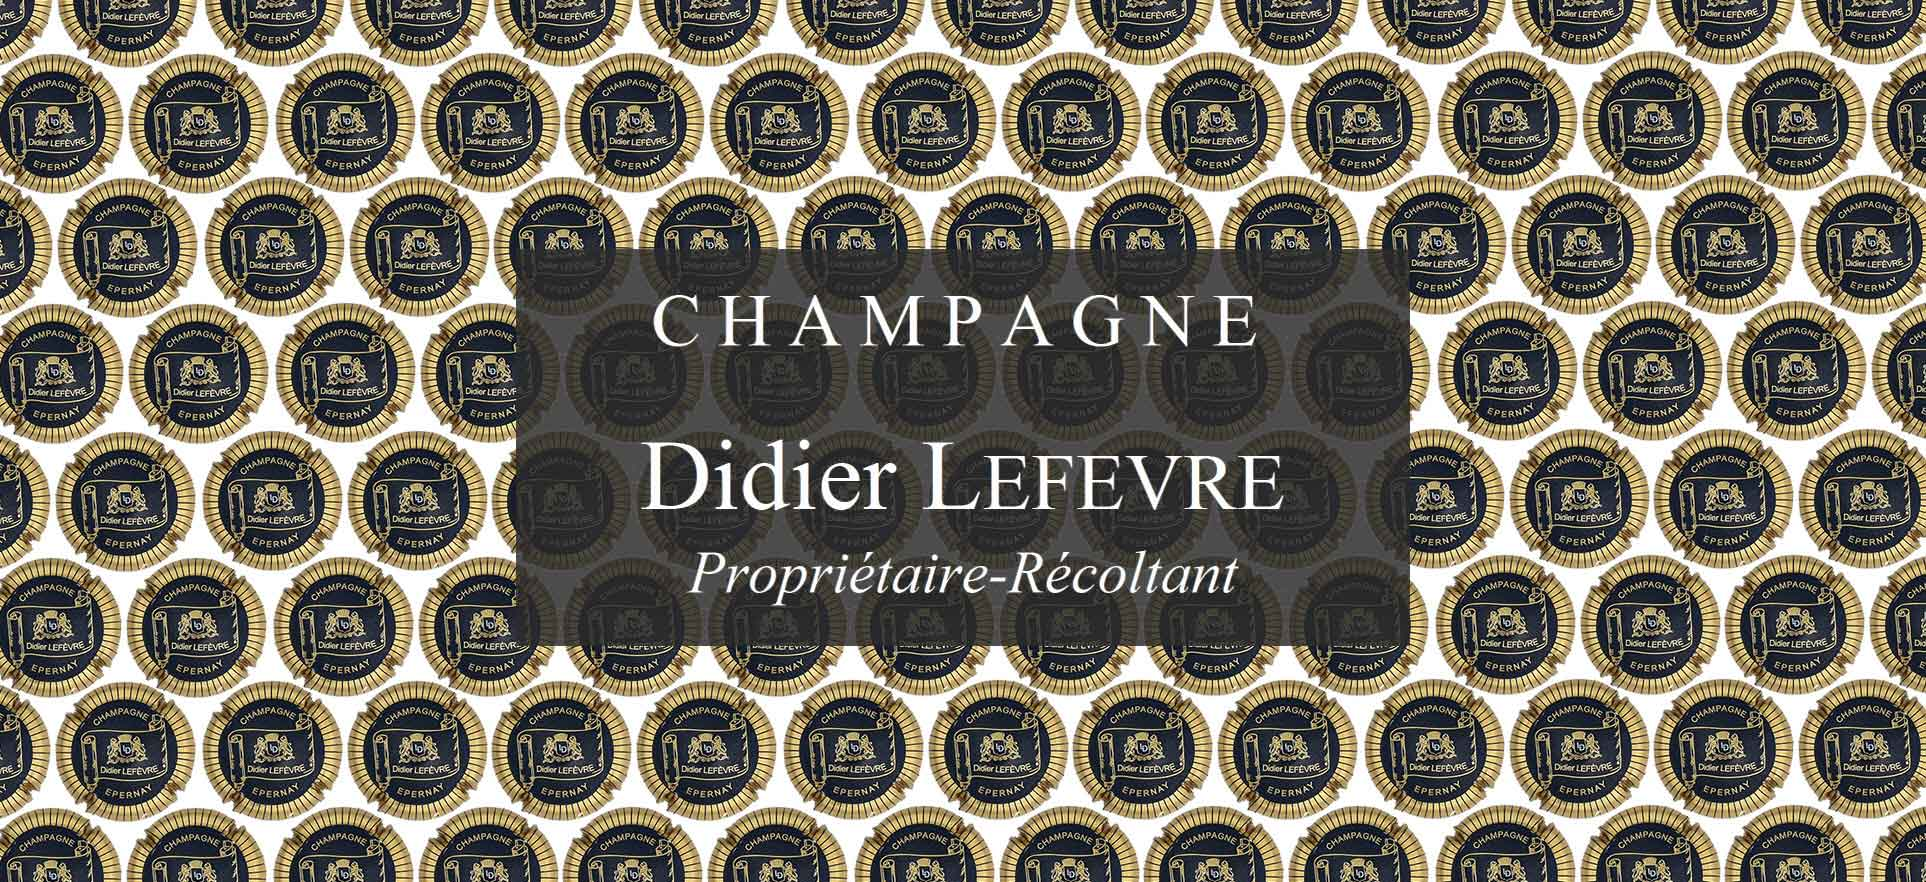 champagne-didier-lefevre